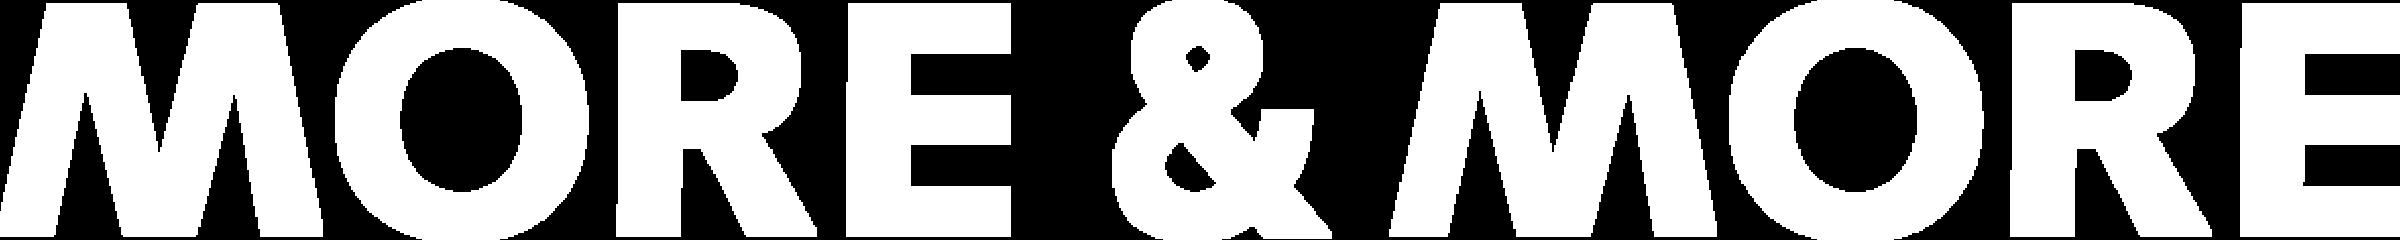 MORE & MORE Logo